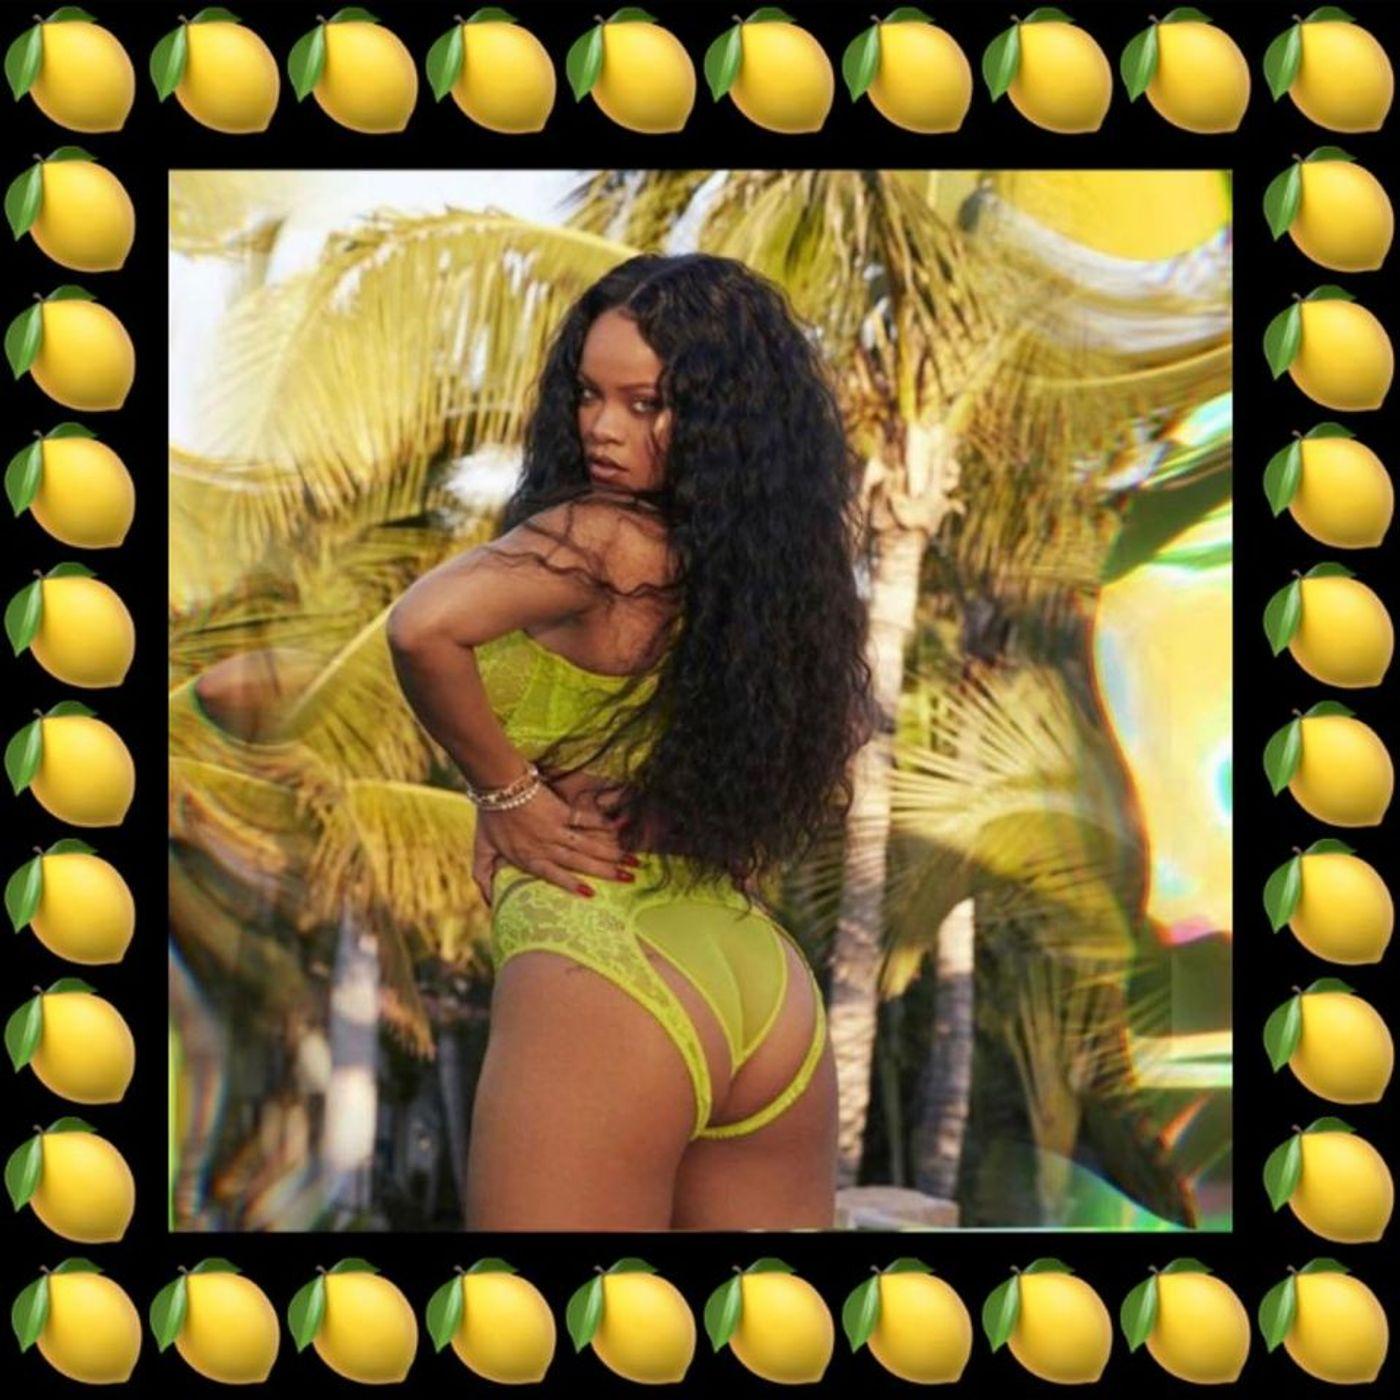 N.E.R.D. ft. Rihanna & Fat Joe X Tommy Montana - Lemon Back (BDJ TikTok Edit)